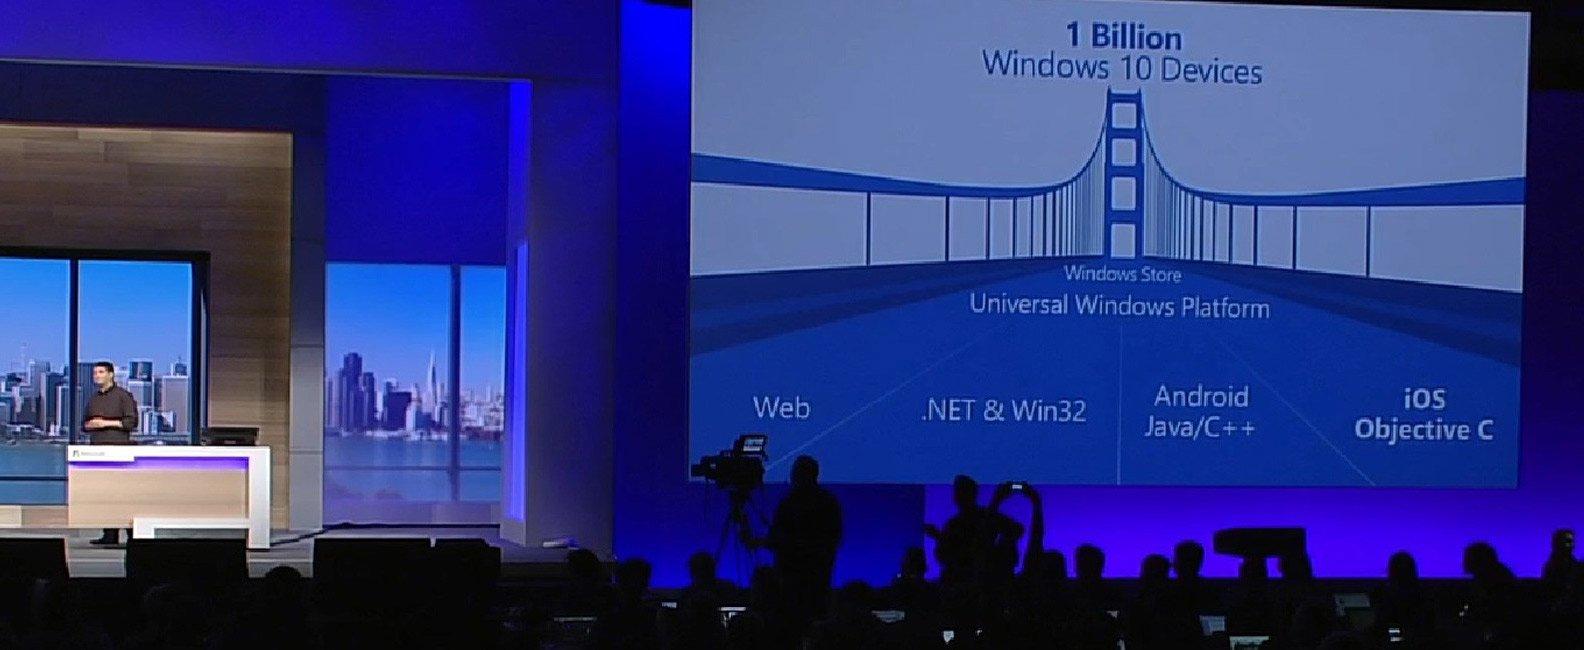 Windows-10-universal-app-UNE-wpcf_1920x650